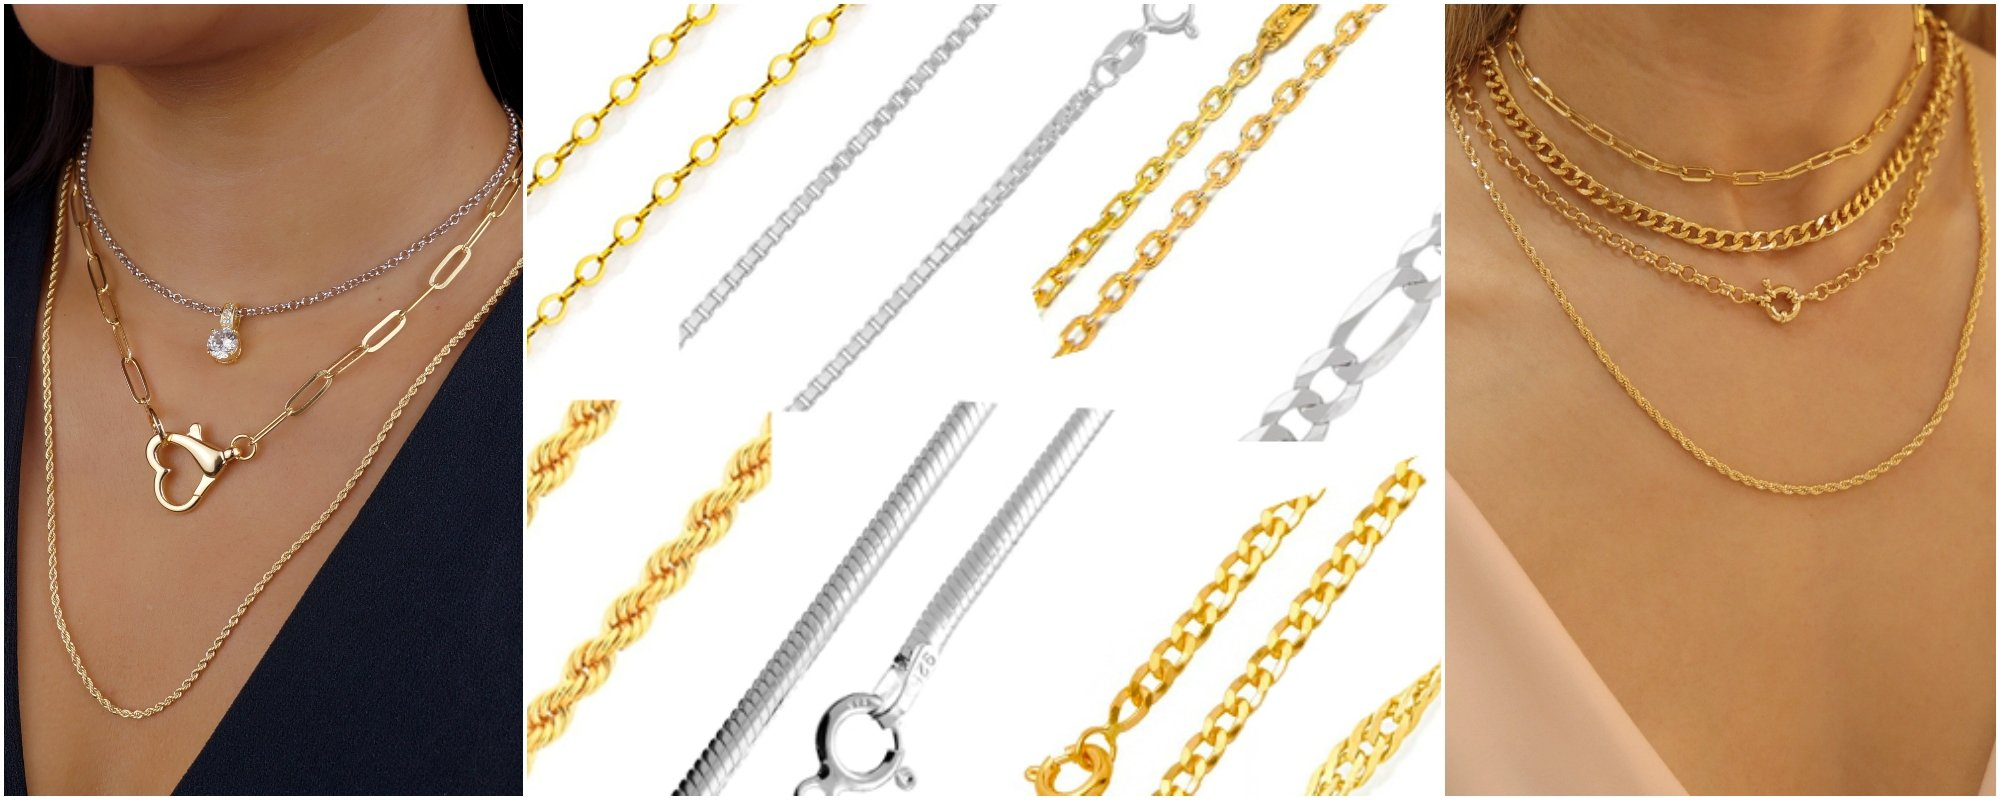 Conheça os 9 tipos de correntes para aderir ao seu estilo!